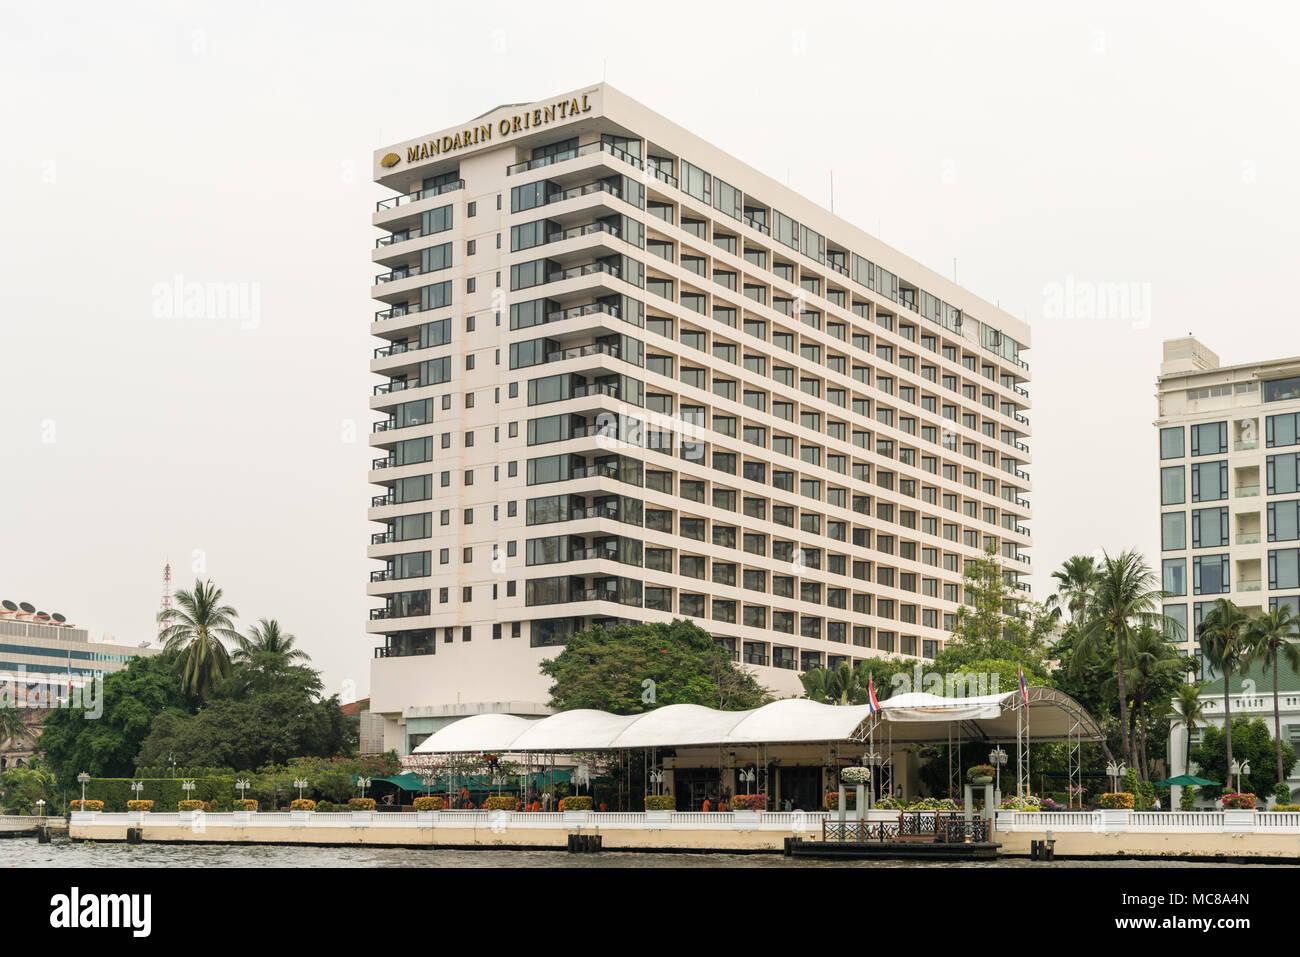 The Mandarin Oriental Hotel in Bangkok Thailand - Stock Image